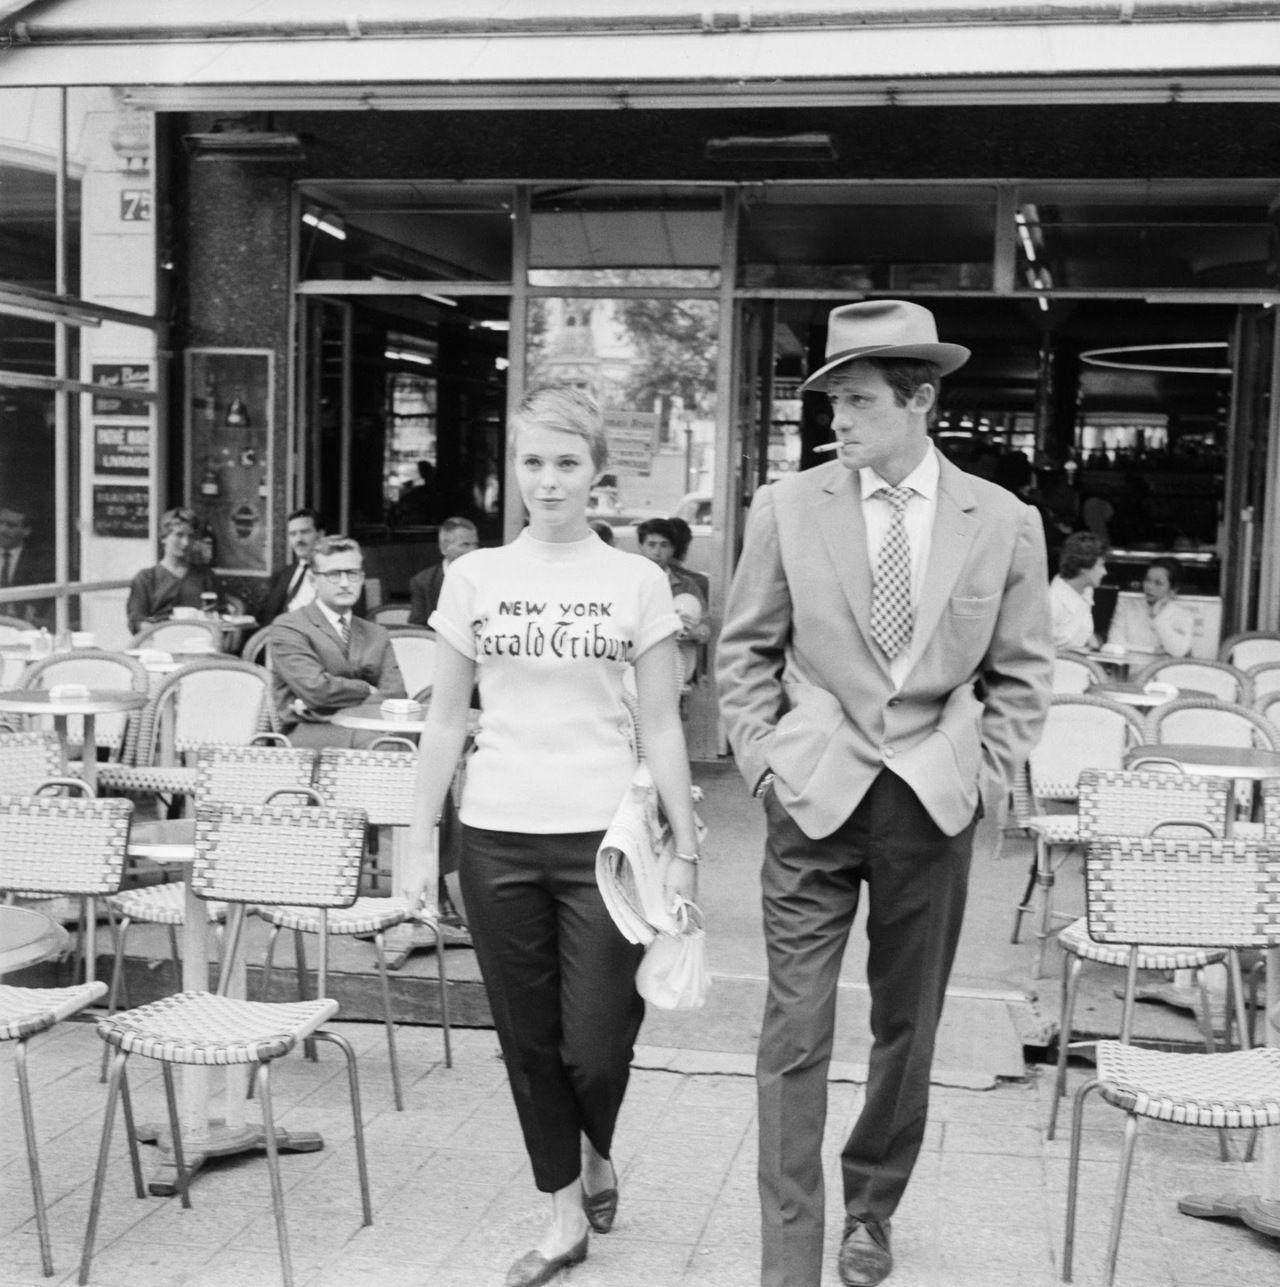 Jean-Luc Godard's Breathless on Criterion